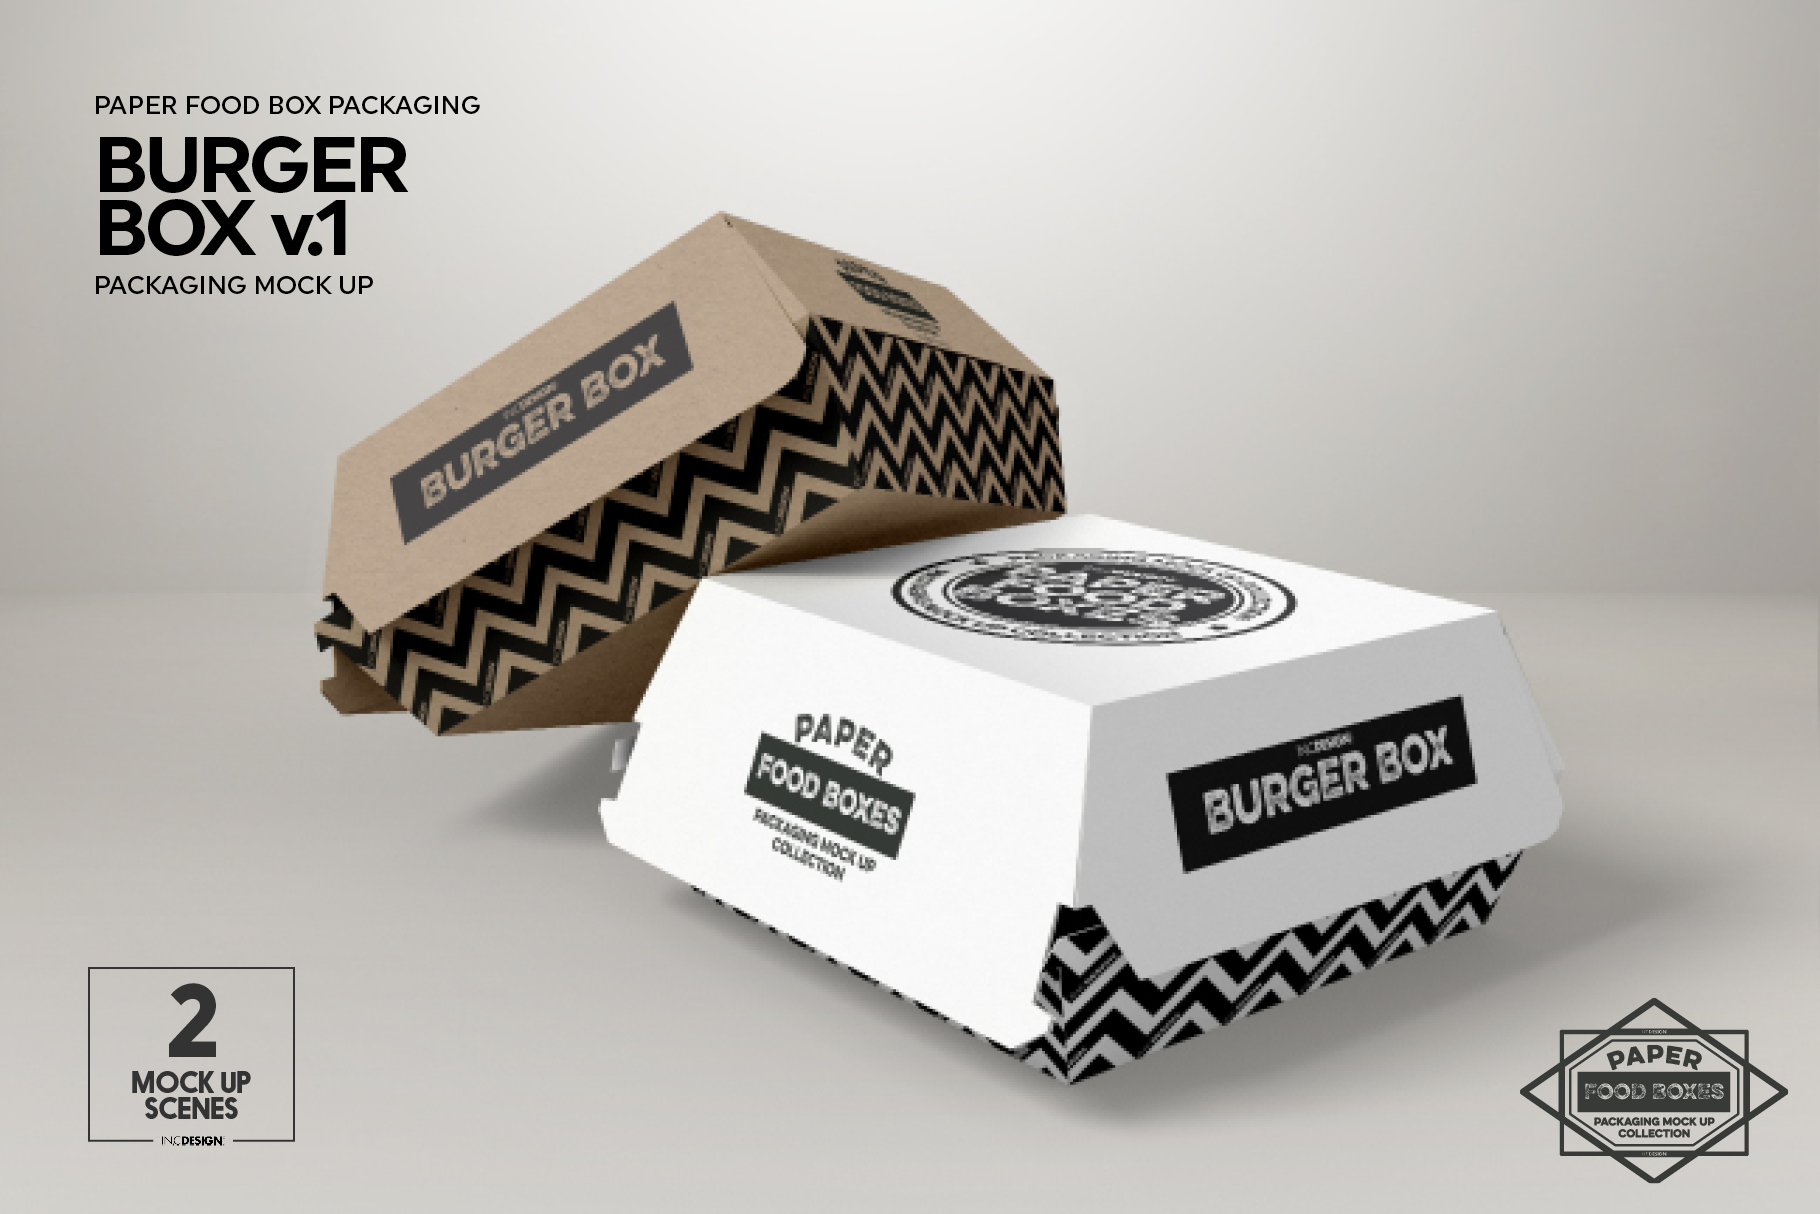 Burger Box Packaging Mock Up v1 example image 5